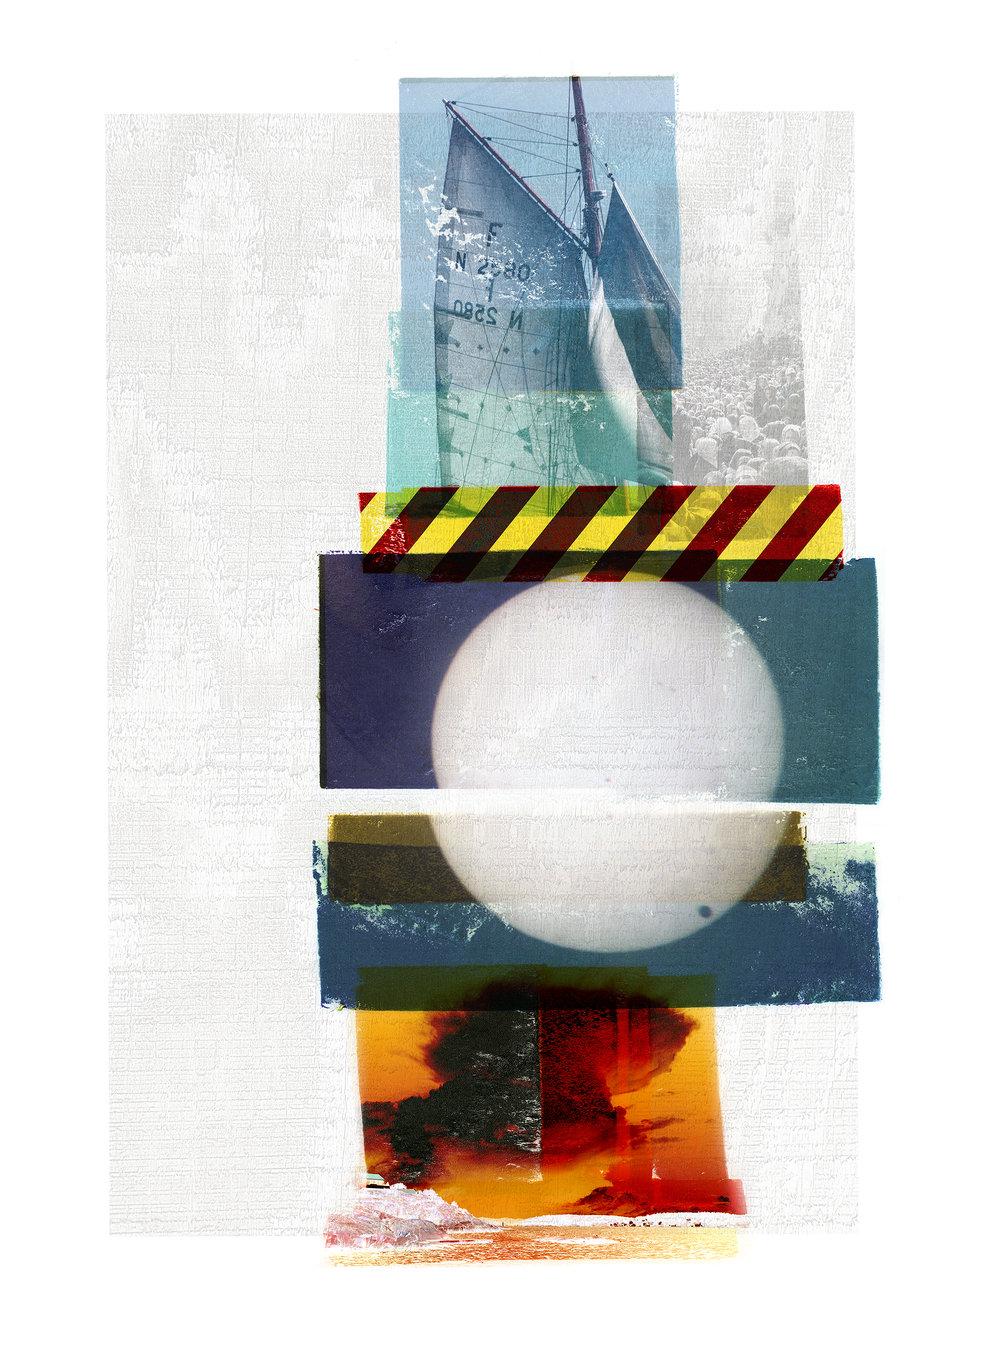 Venus Passage / Yarmouk / Borøya (Archipelago)  Original pigment print / BFK rives 250 gr 56 x 76 cm / 22 x 30 in Edition of 50 + 7 Ap Editeur: Per Fronth Studios / Henrik Aunevik  08/2014: